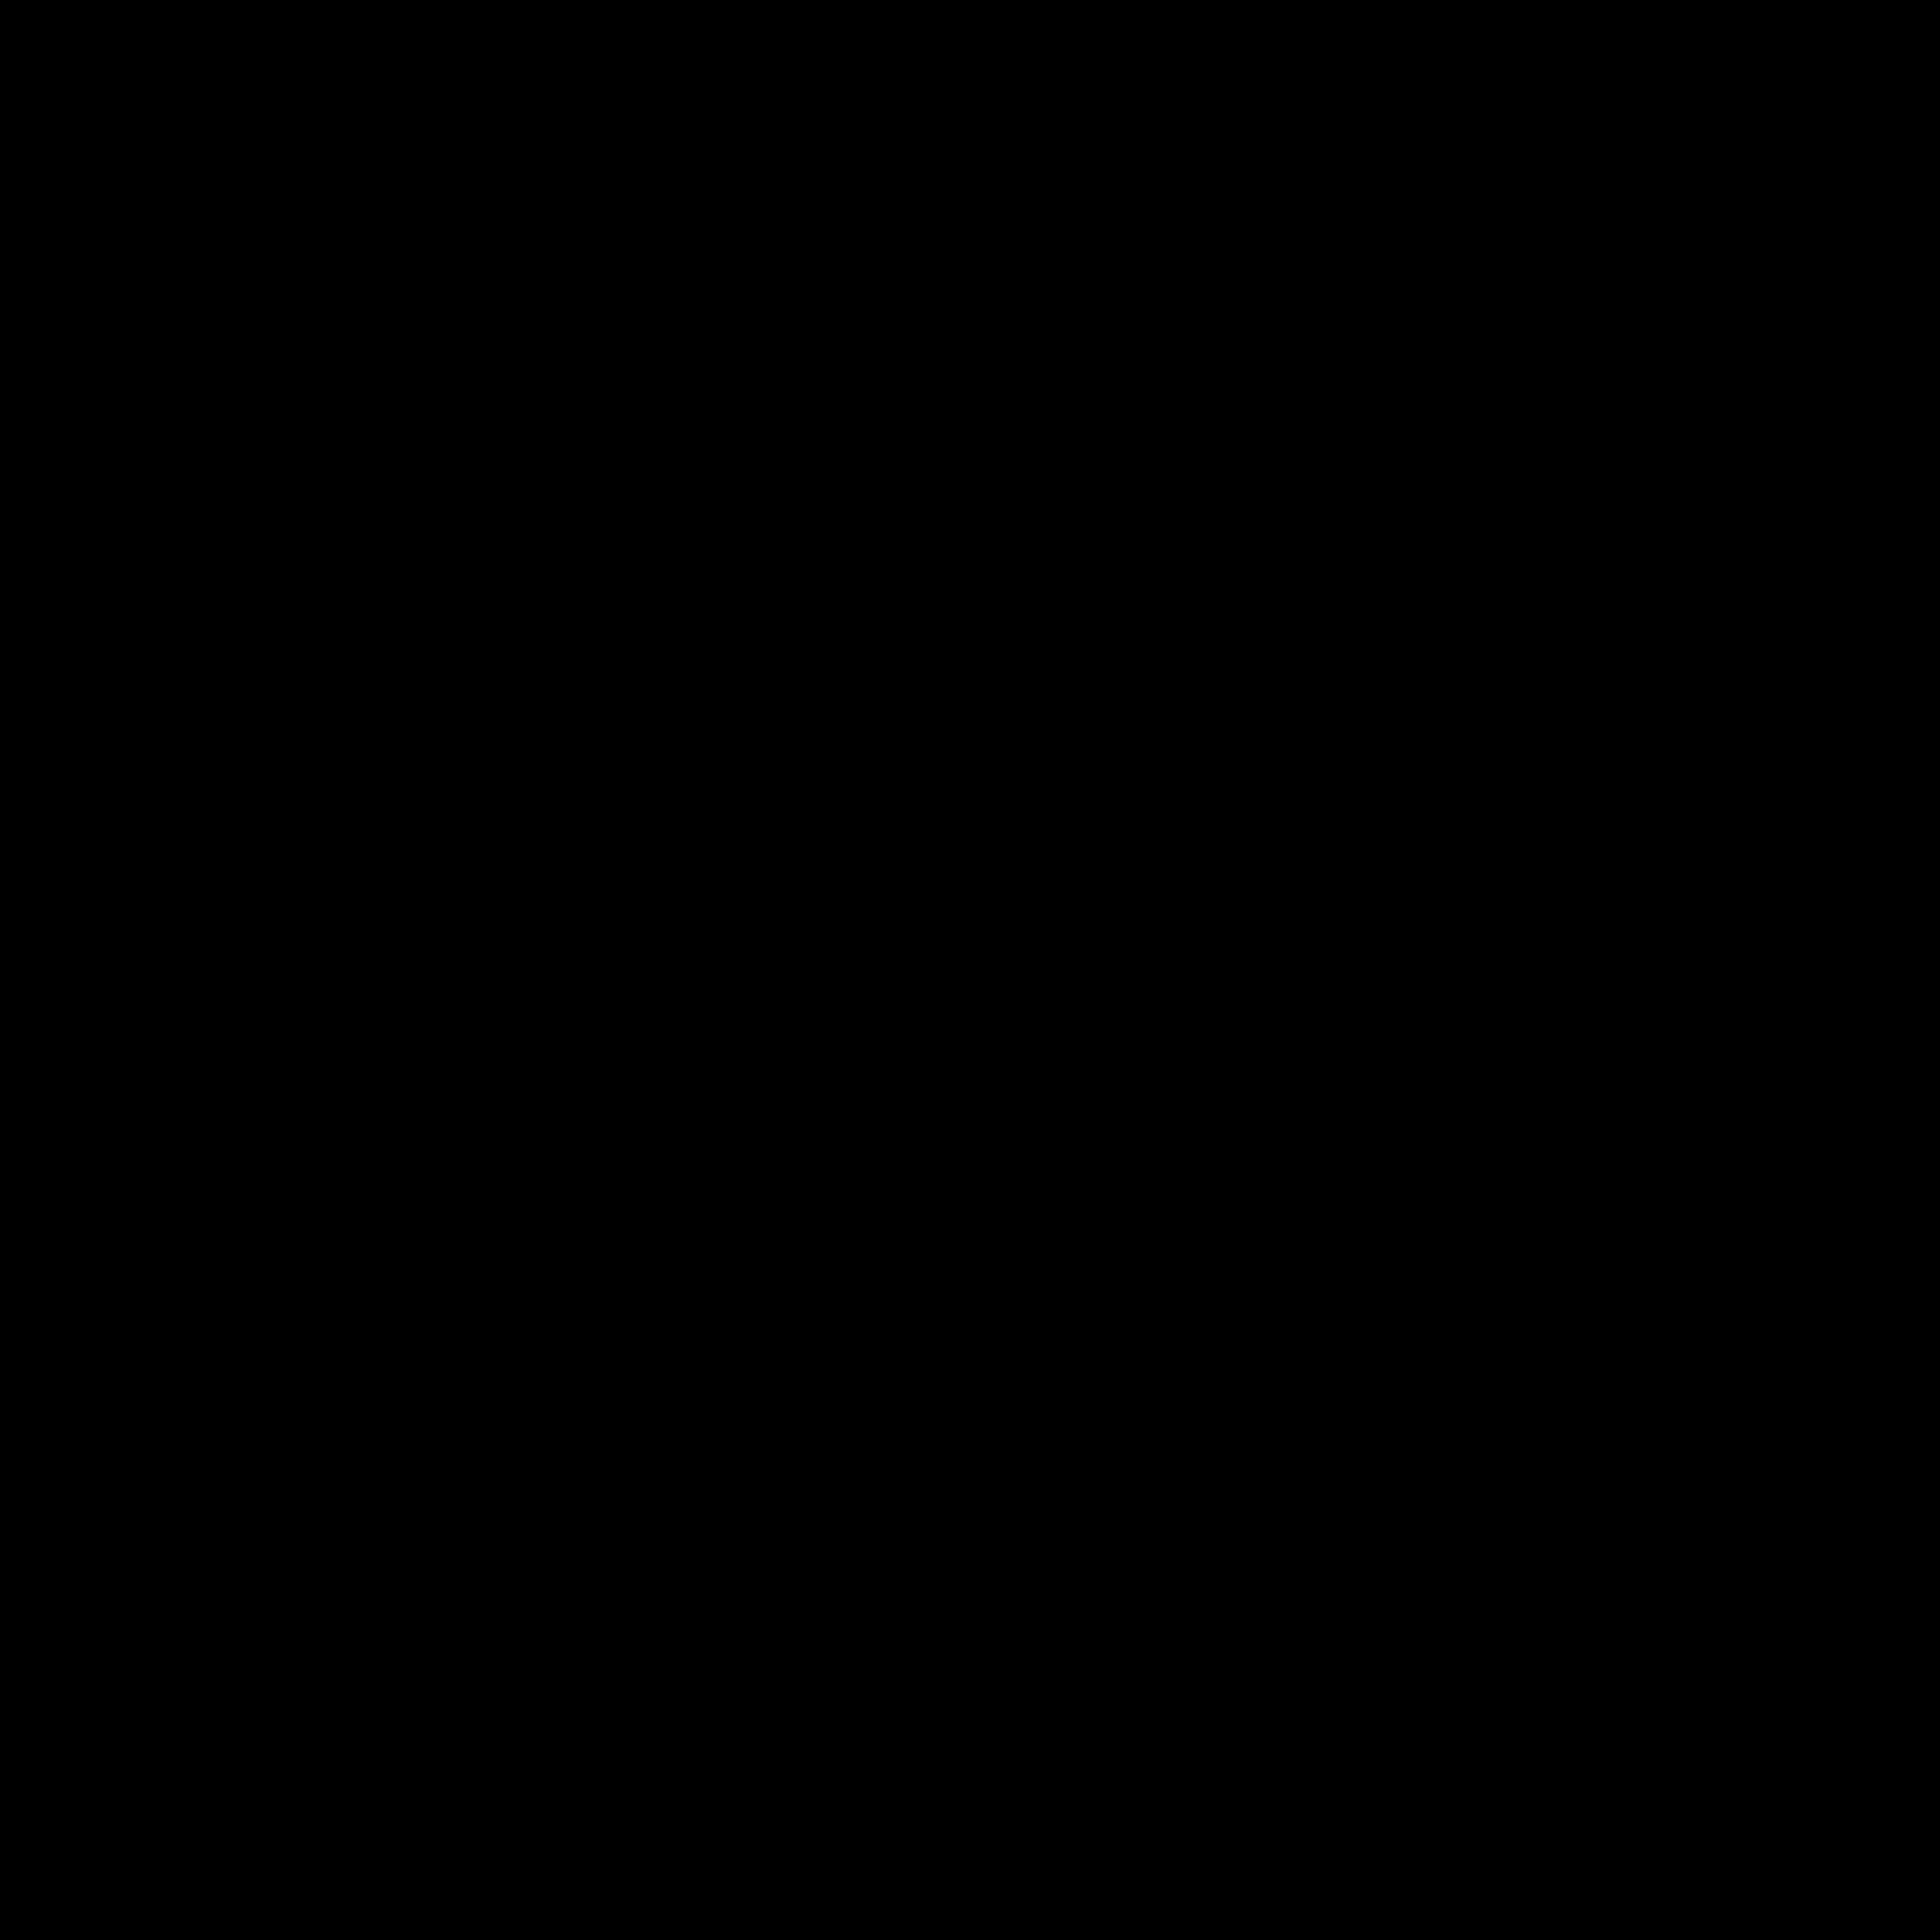 Logo clipart website .